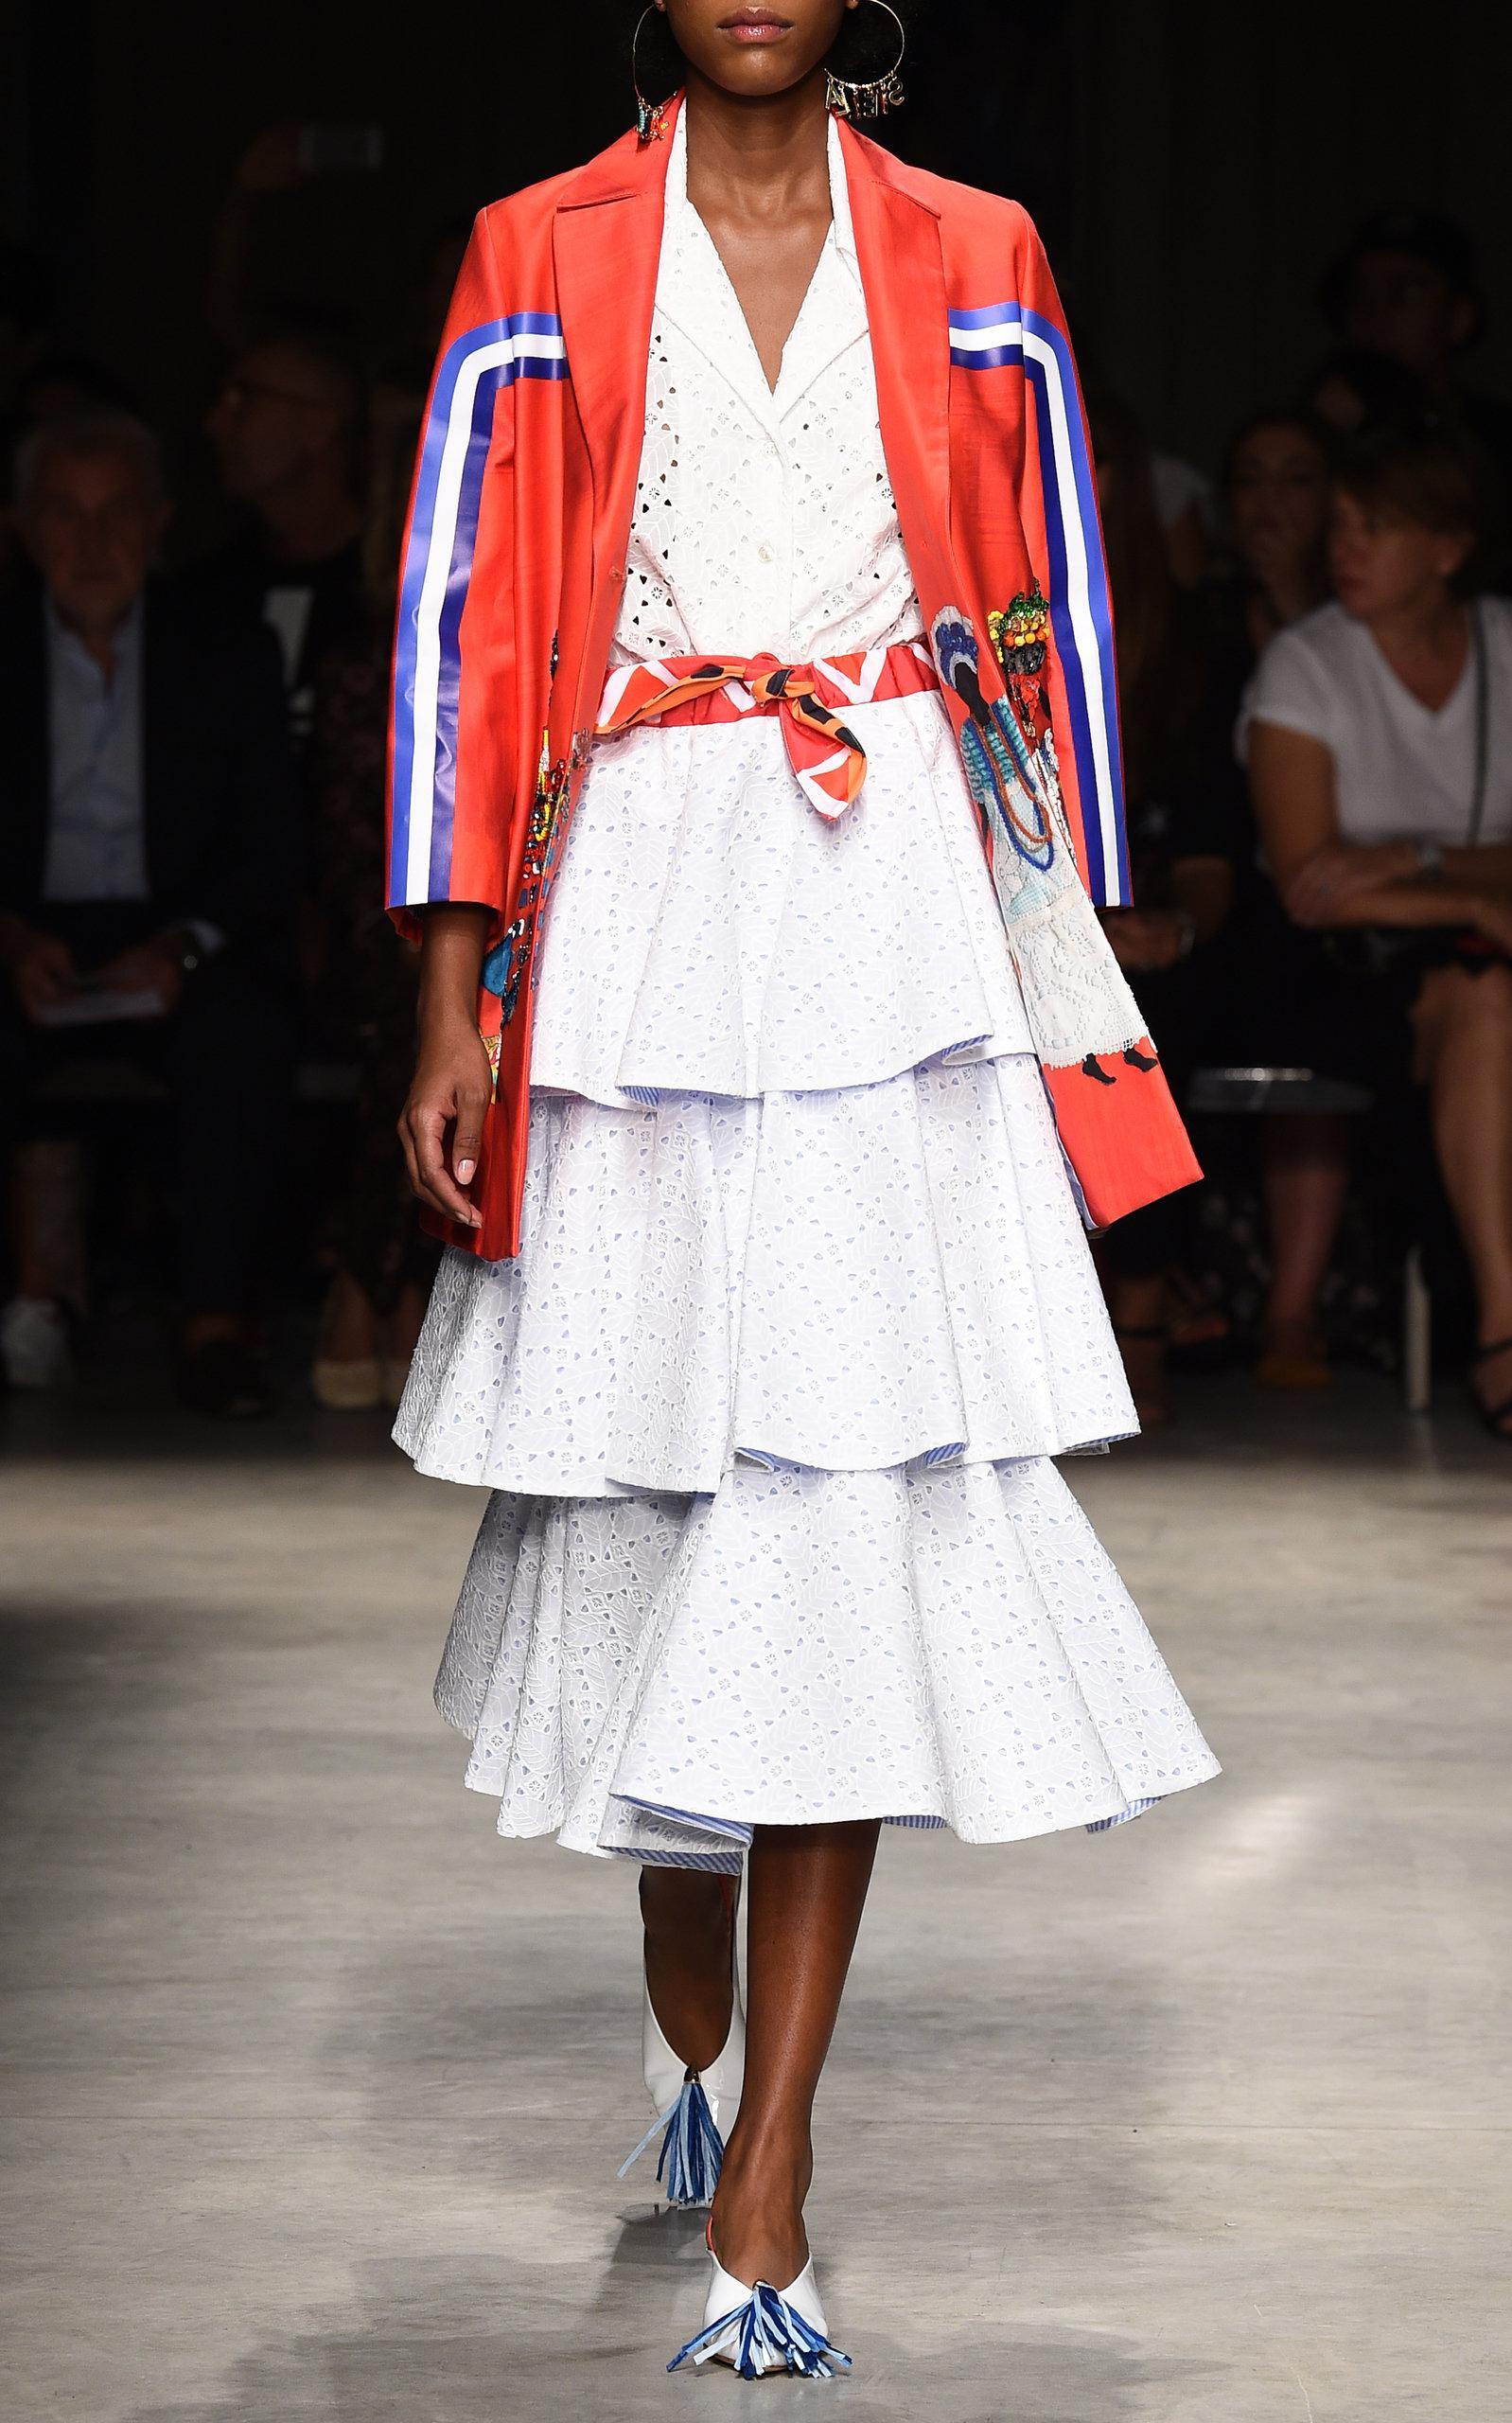 de2d32b4aa Lyst - Stella Jean Sangallo Midi Skirt in White